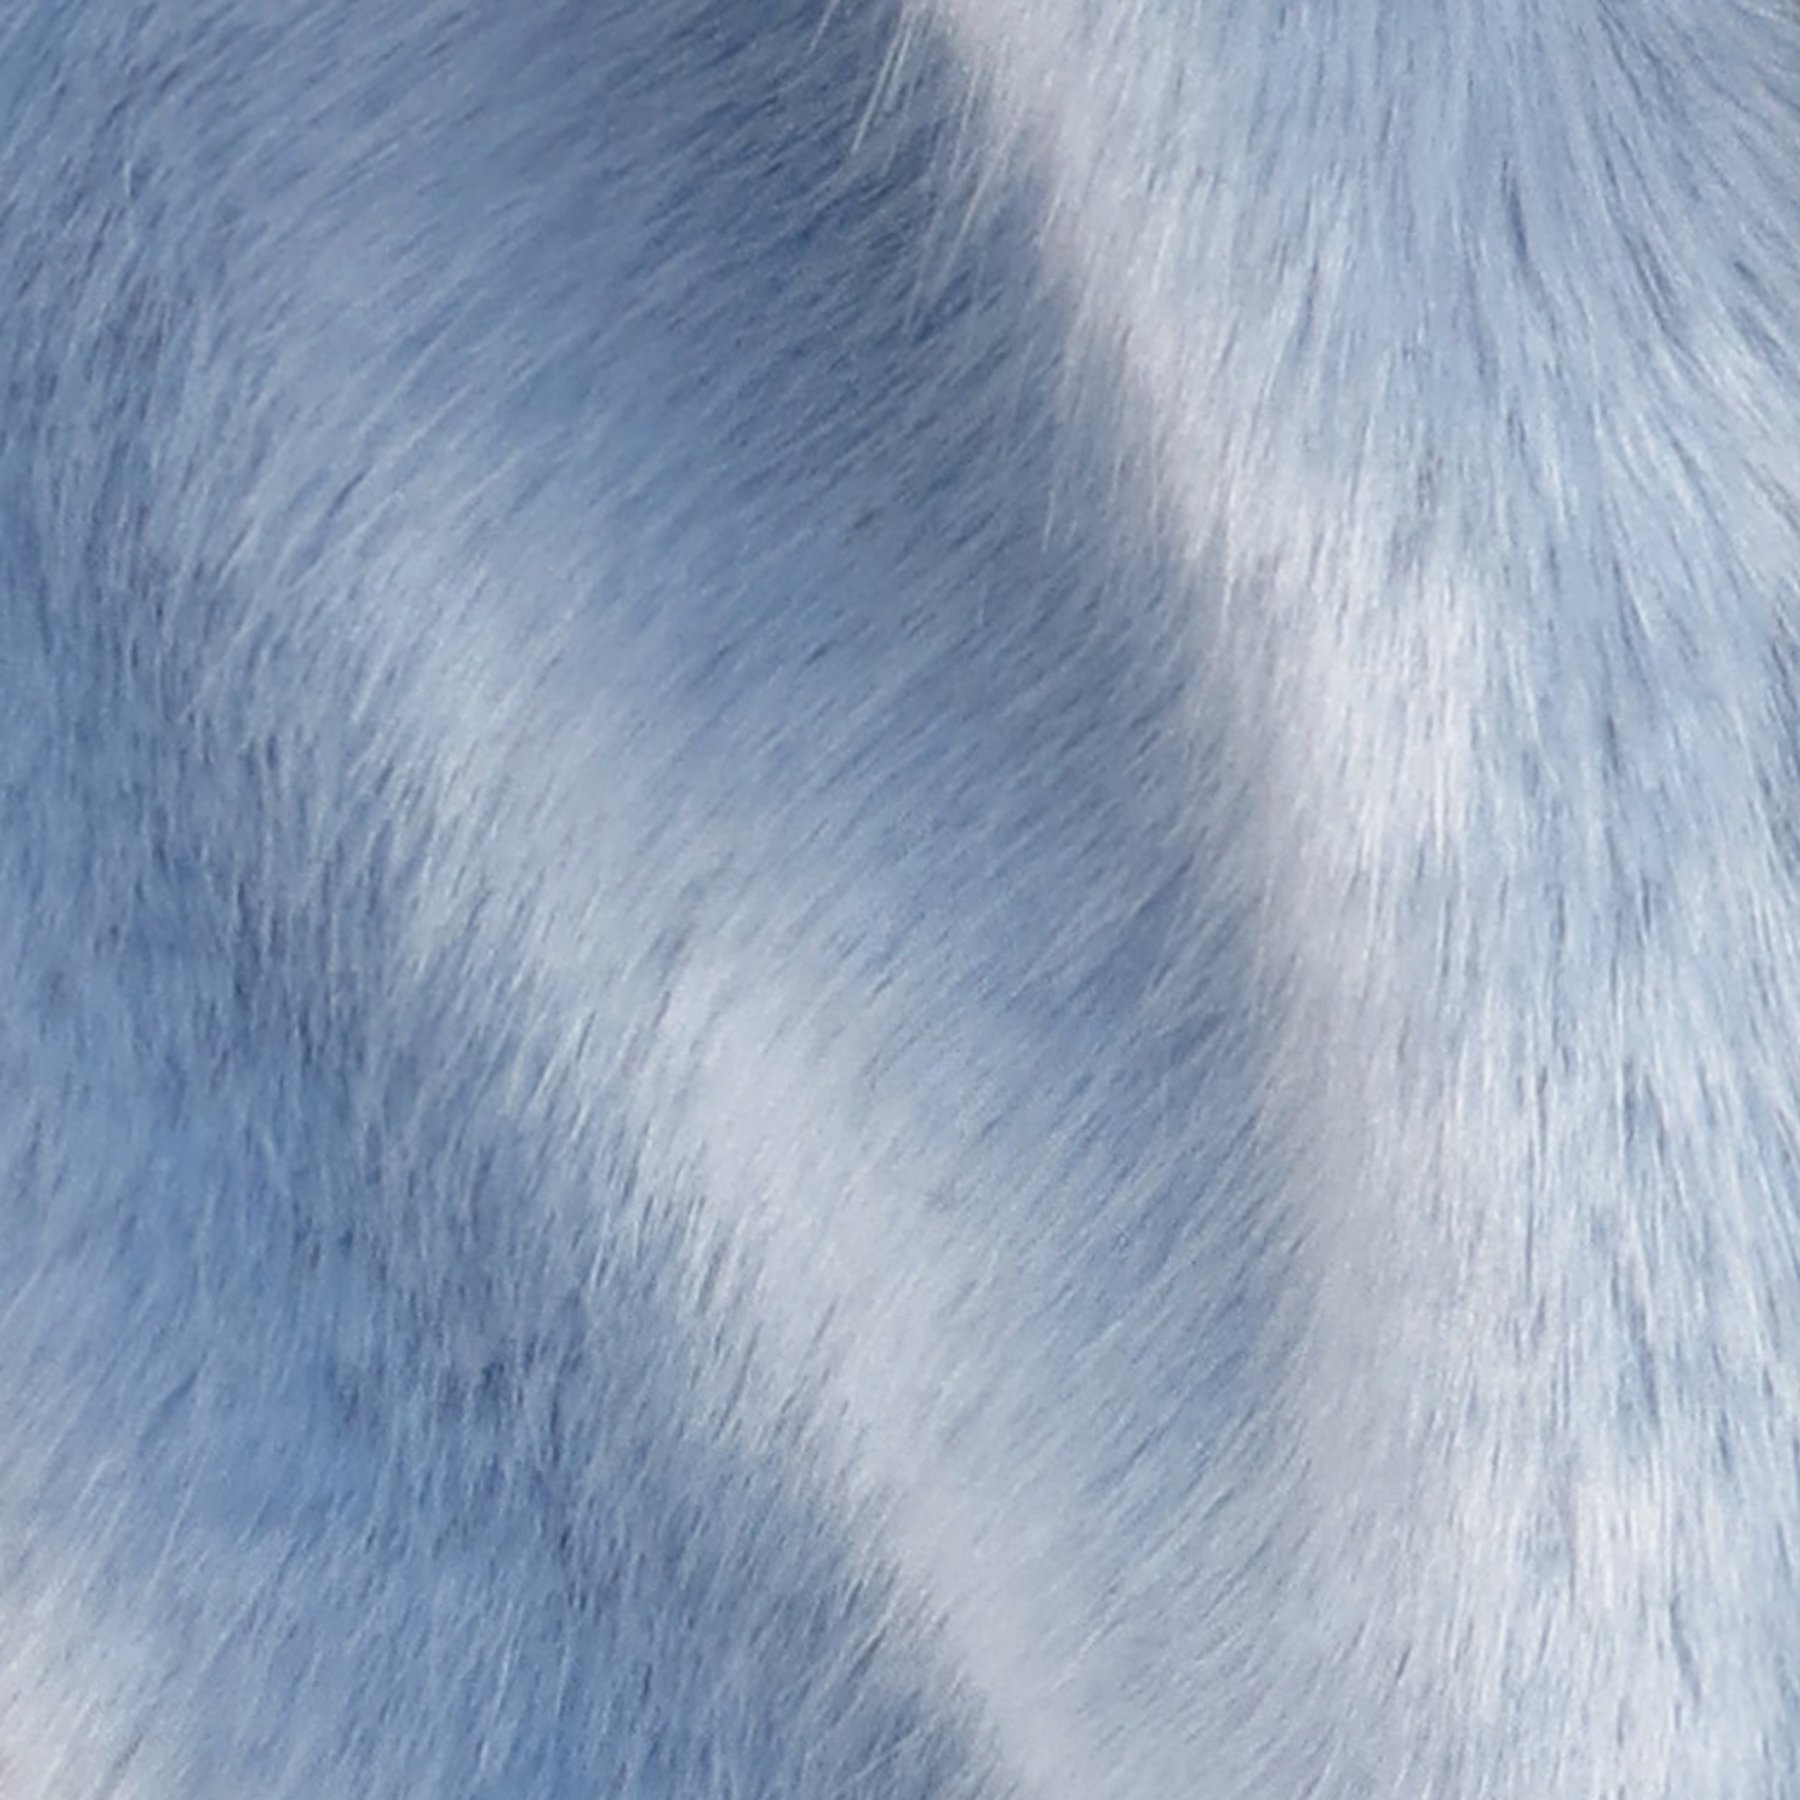 Powder Blue Swatch